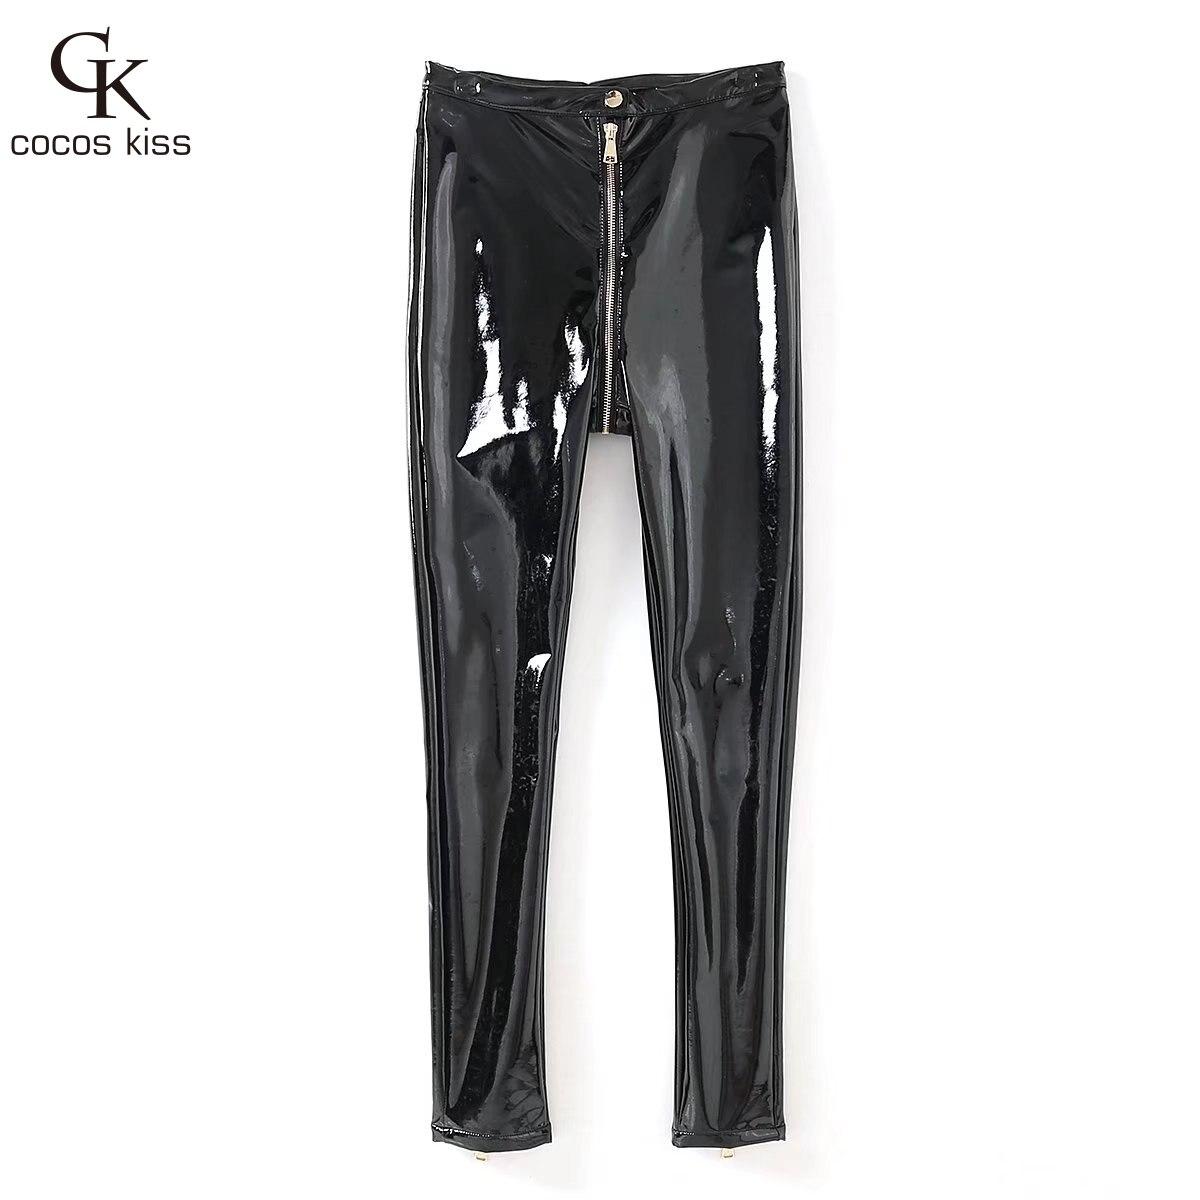 2018 New Fashion Cool Wonderful Leather Black Shiny Zipper Stretch Slim Hot Attractive Temperament Beautiful Womens Trousers